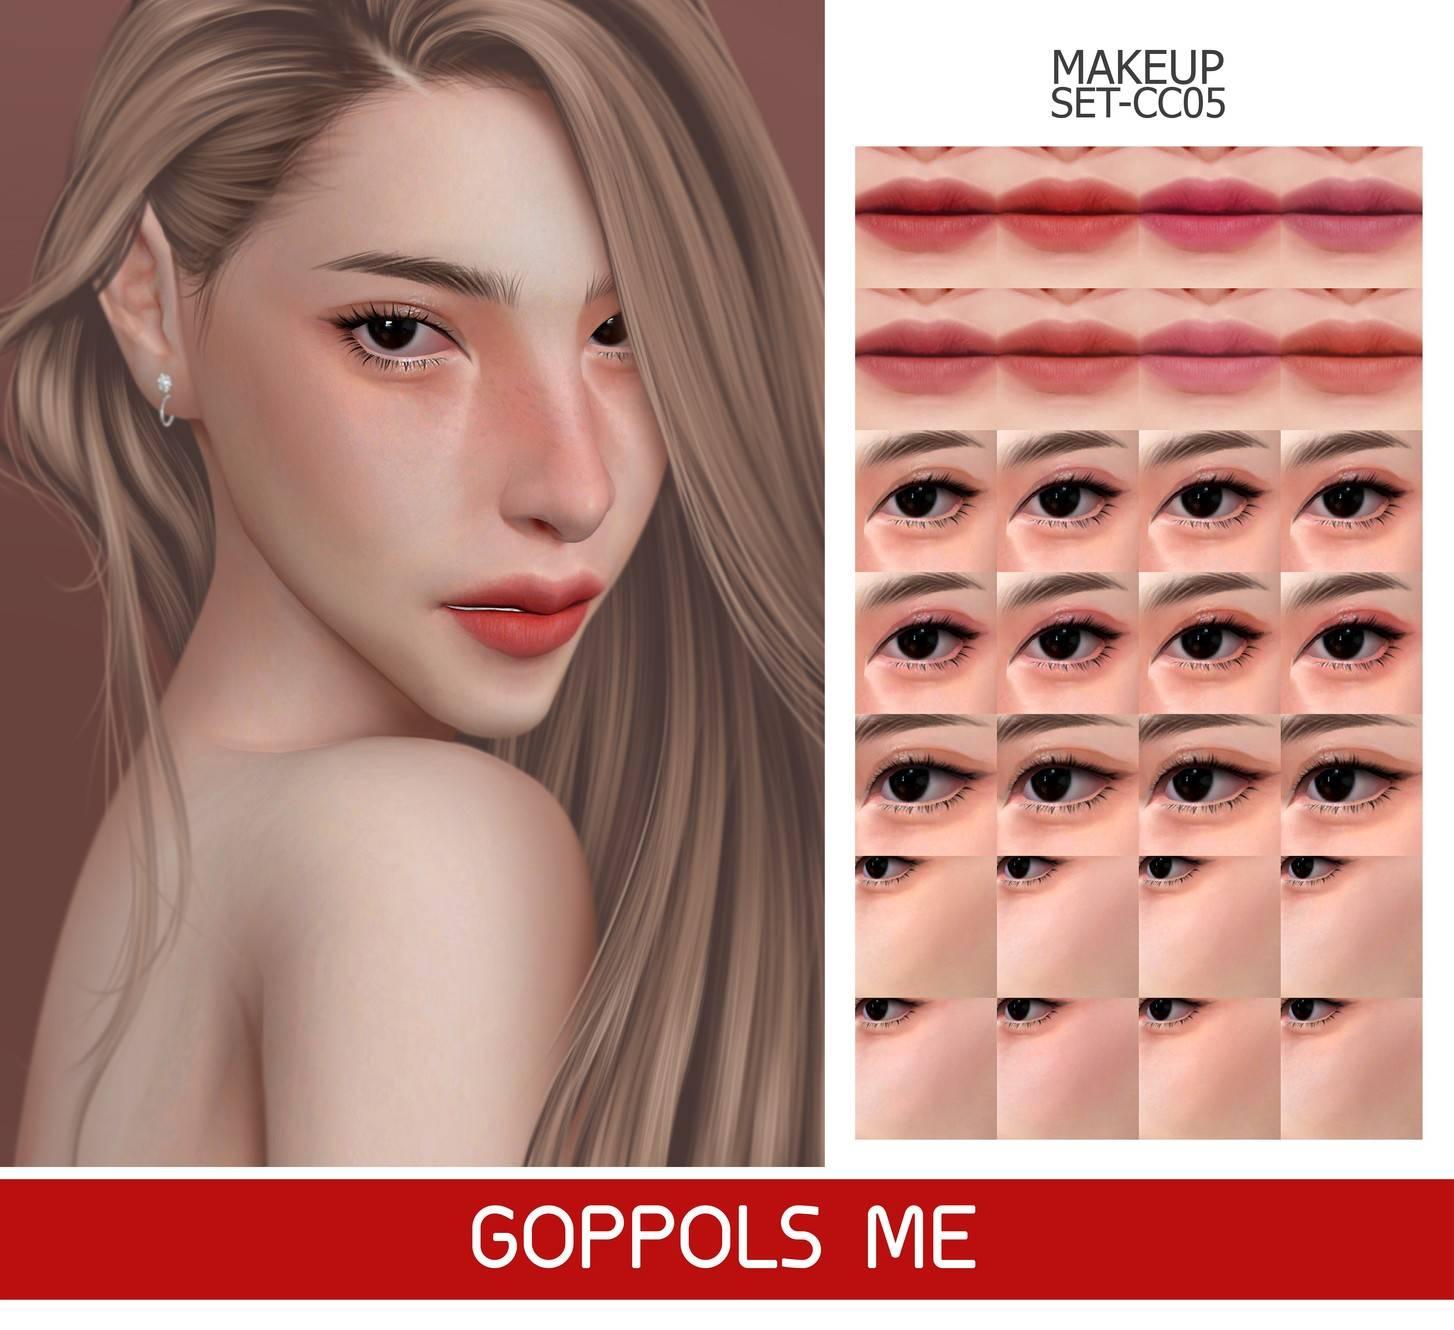 Набор косметики - MAKEUP SET CC05